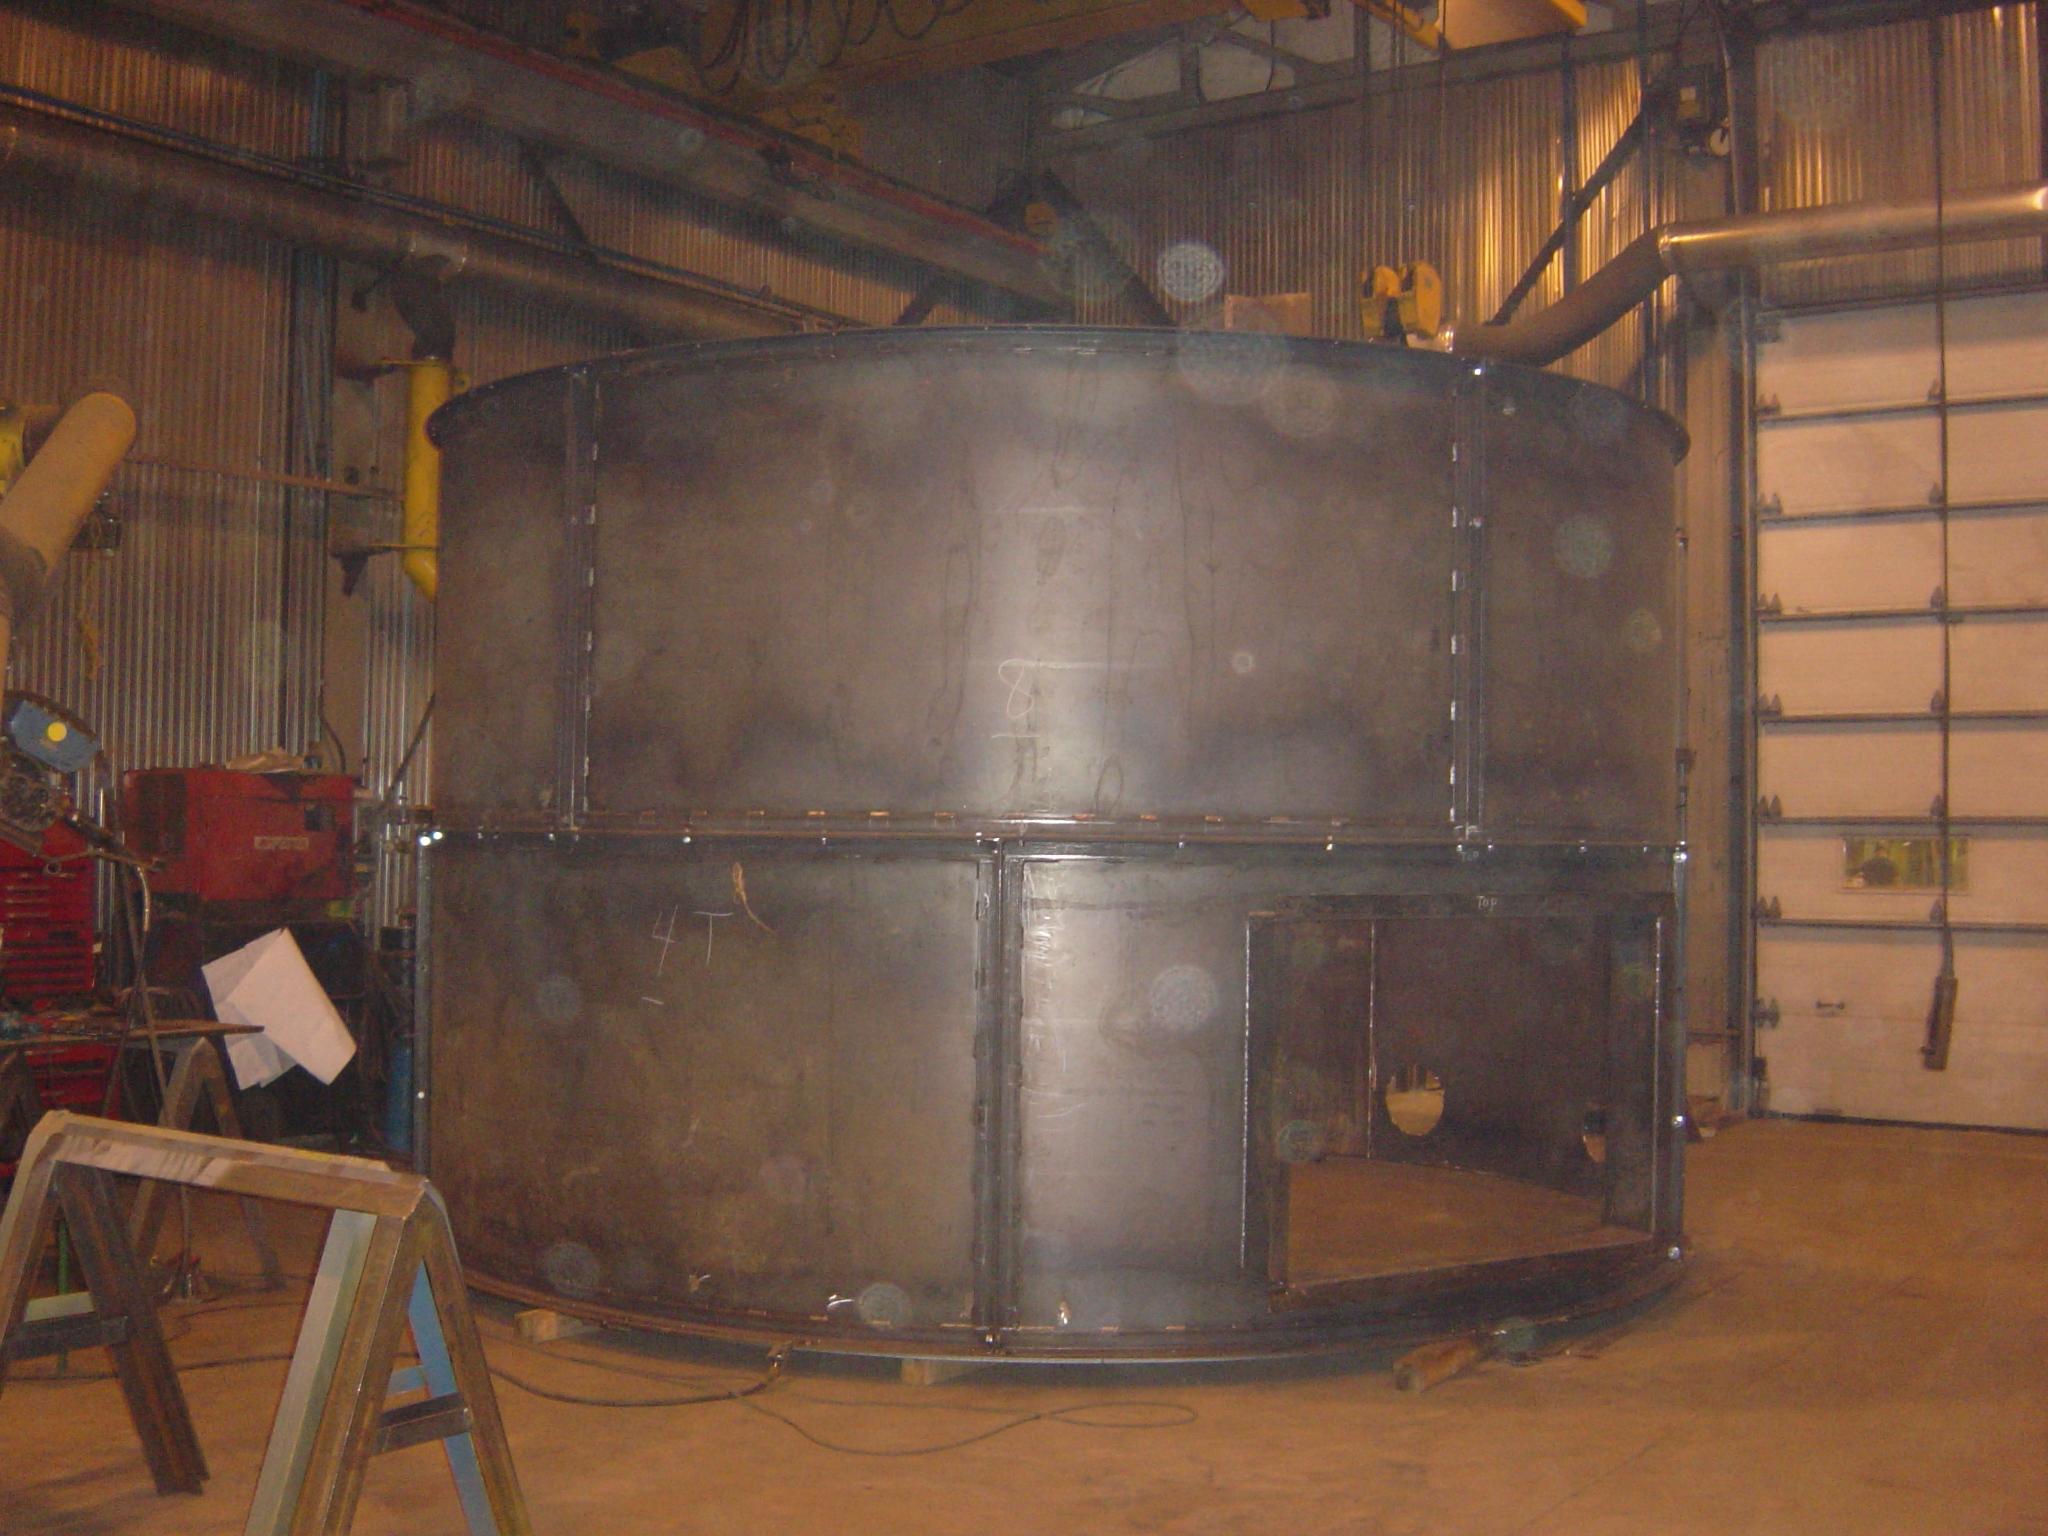 Water-storage--tank